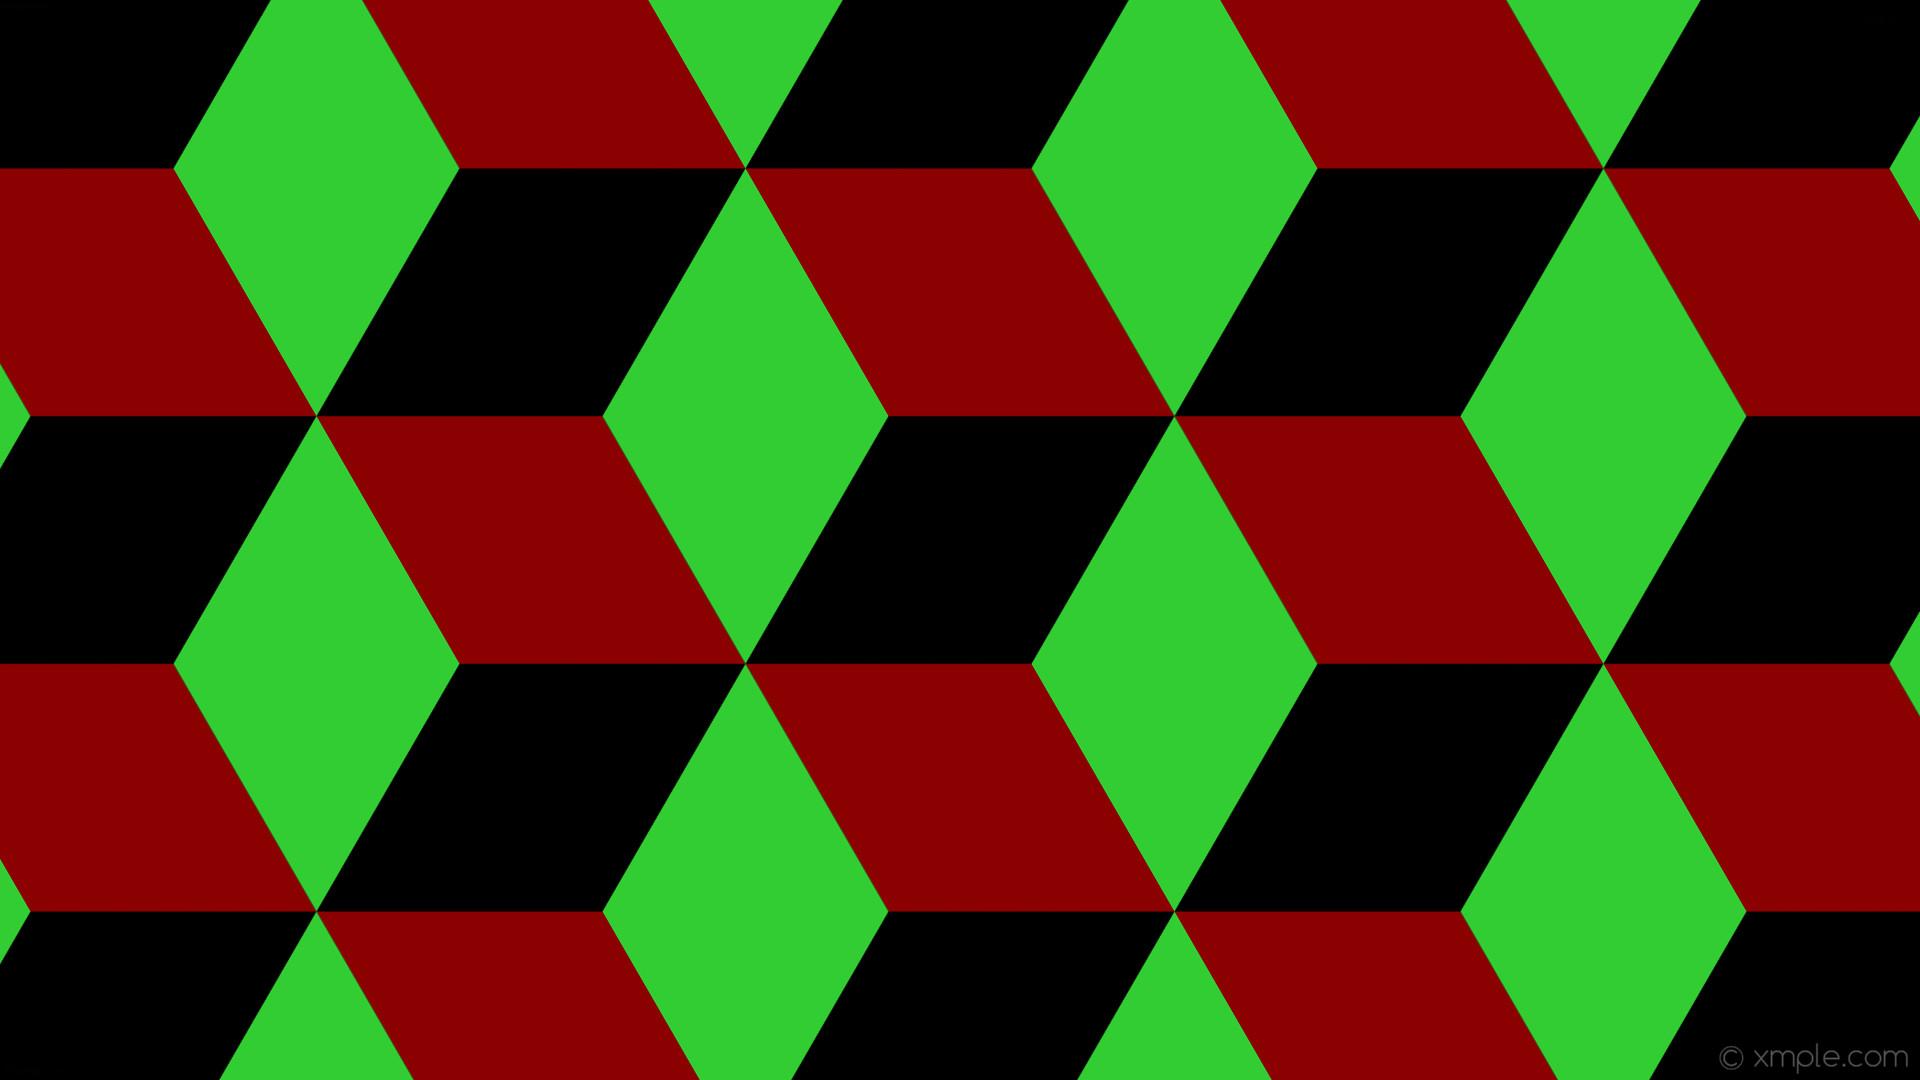 wallpaper green red 3d cubes black dark red lime green #000000 #8b0000  #32cd32